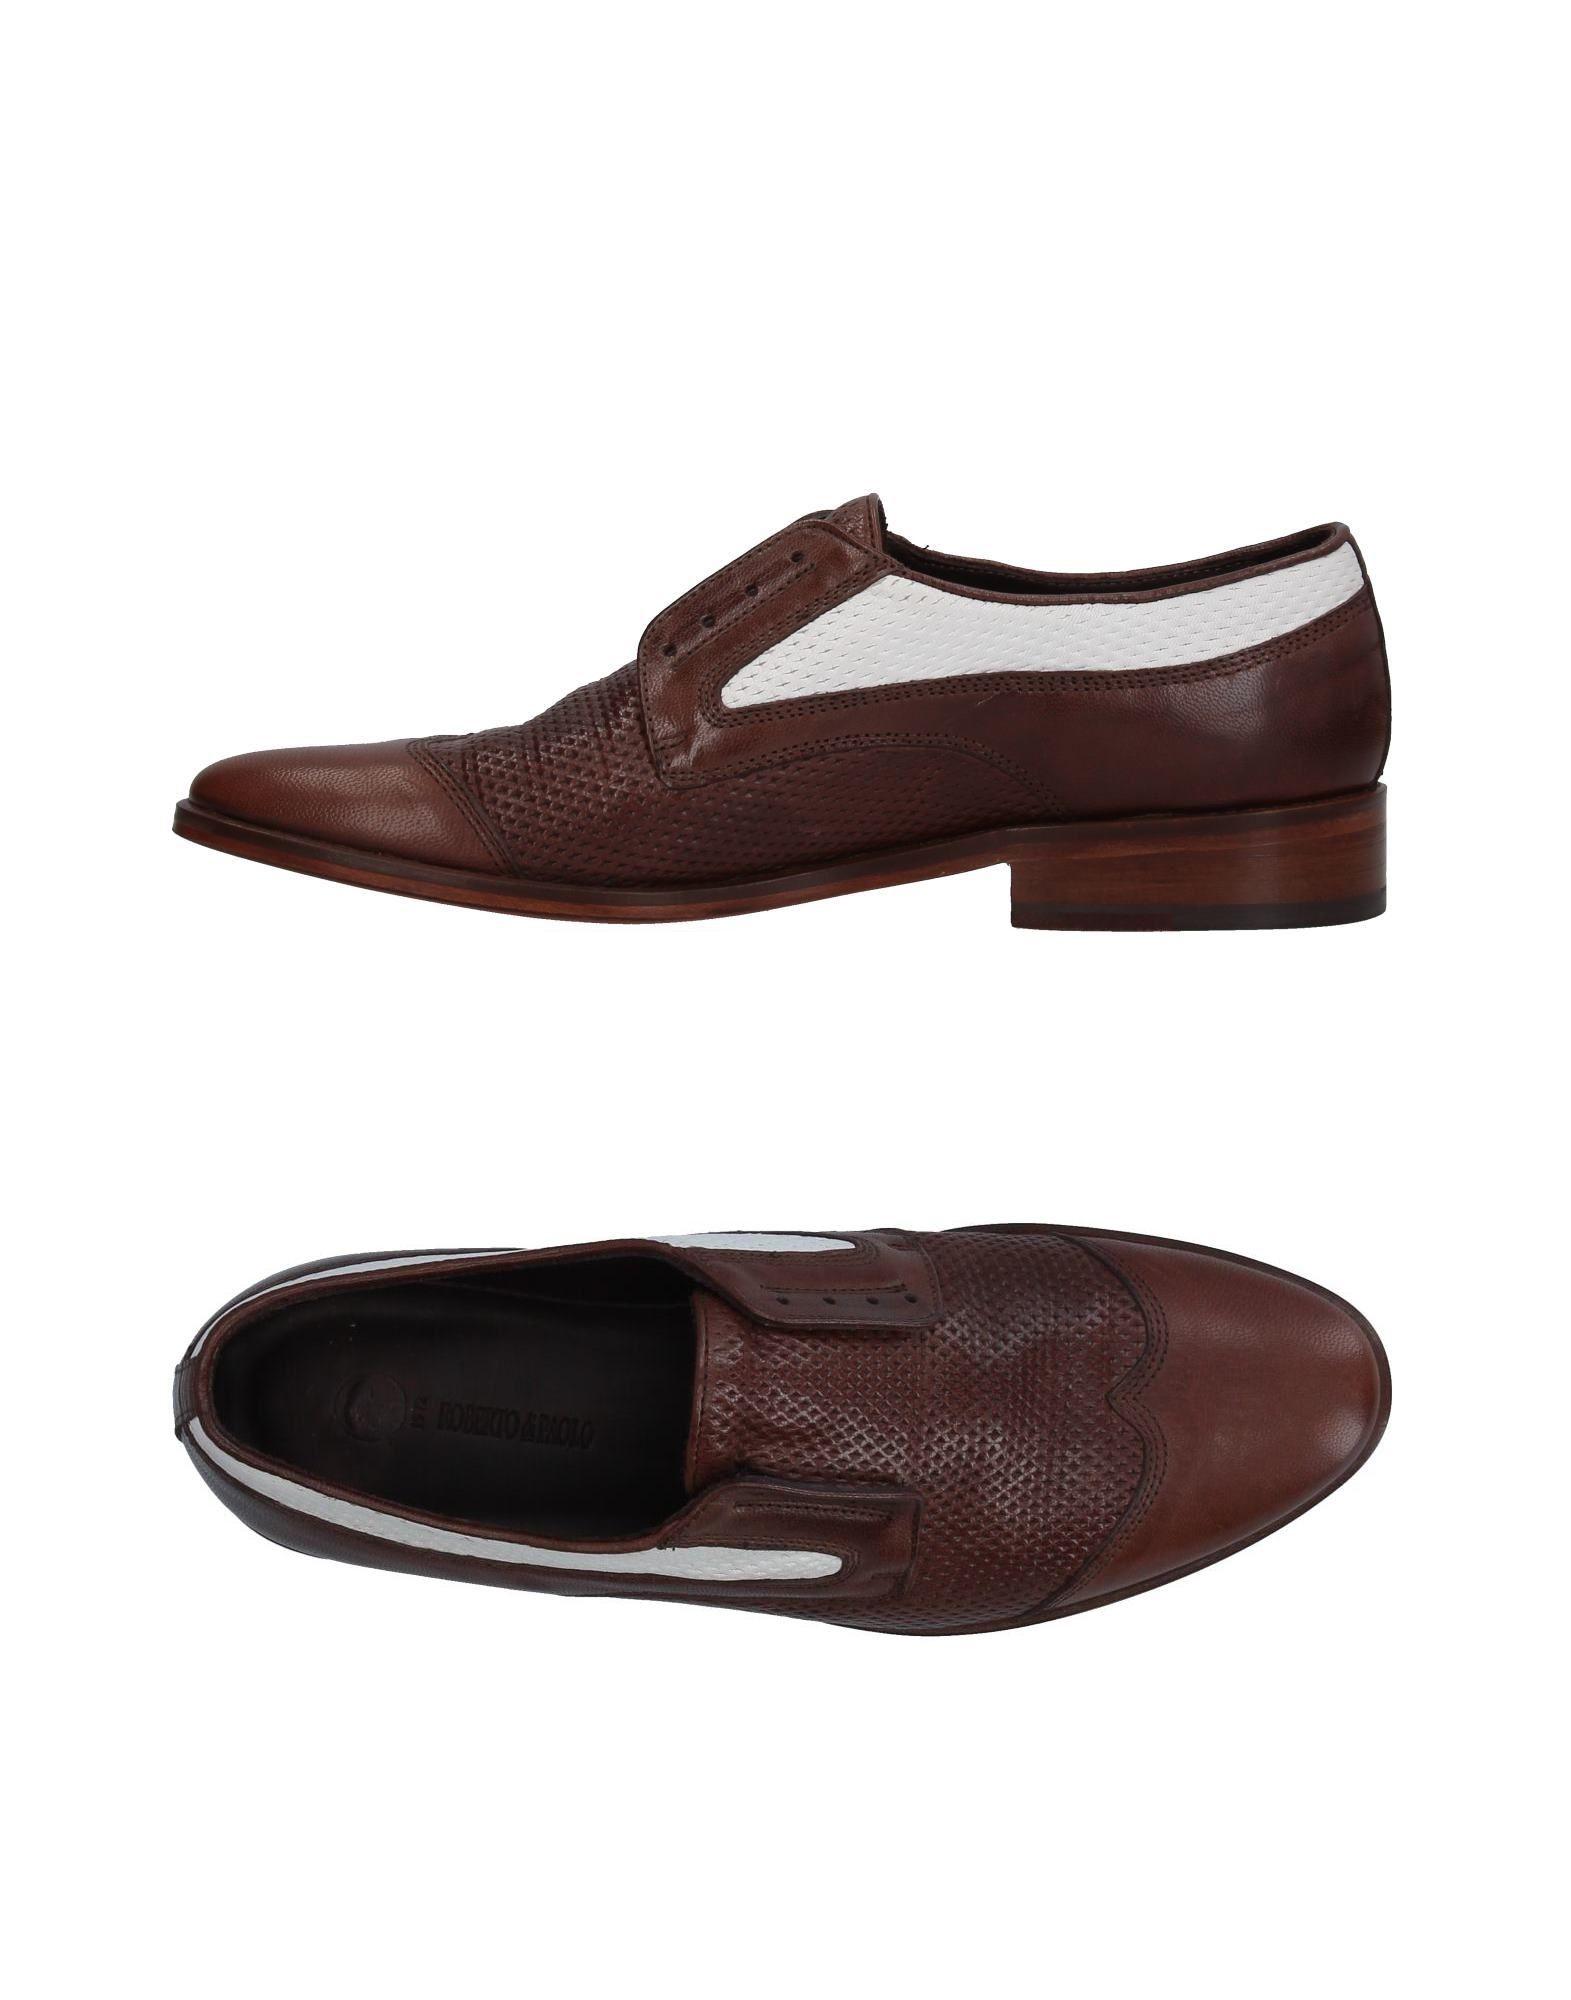 Stilvolle billige Schuhe Roberto Di Paolo Schnürschuhe Damen  11357978UN